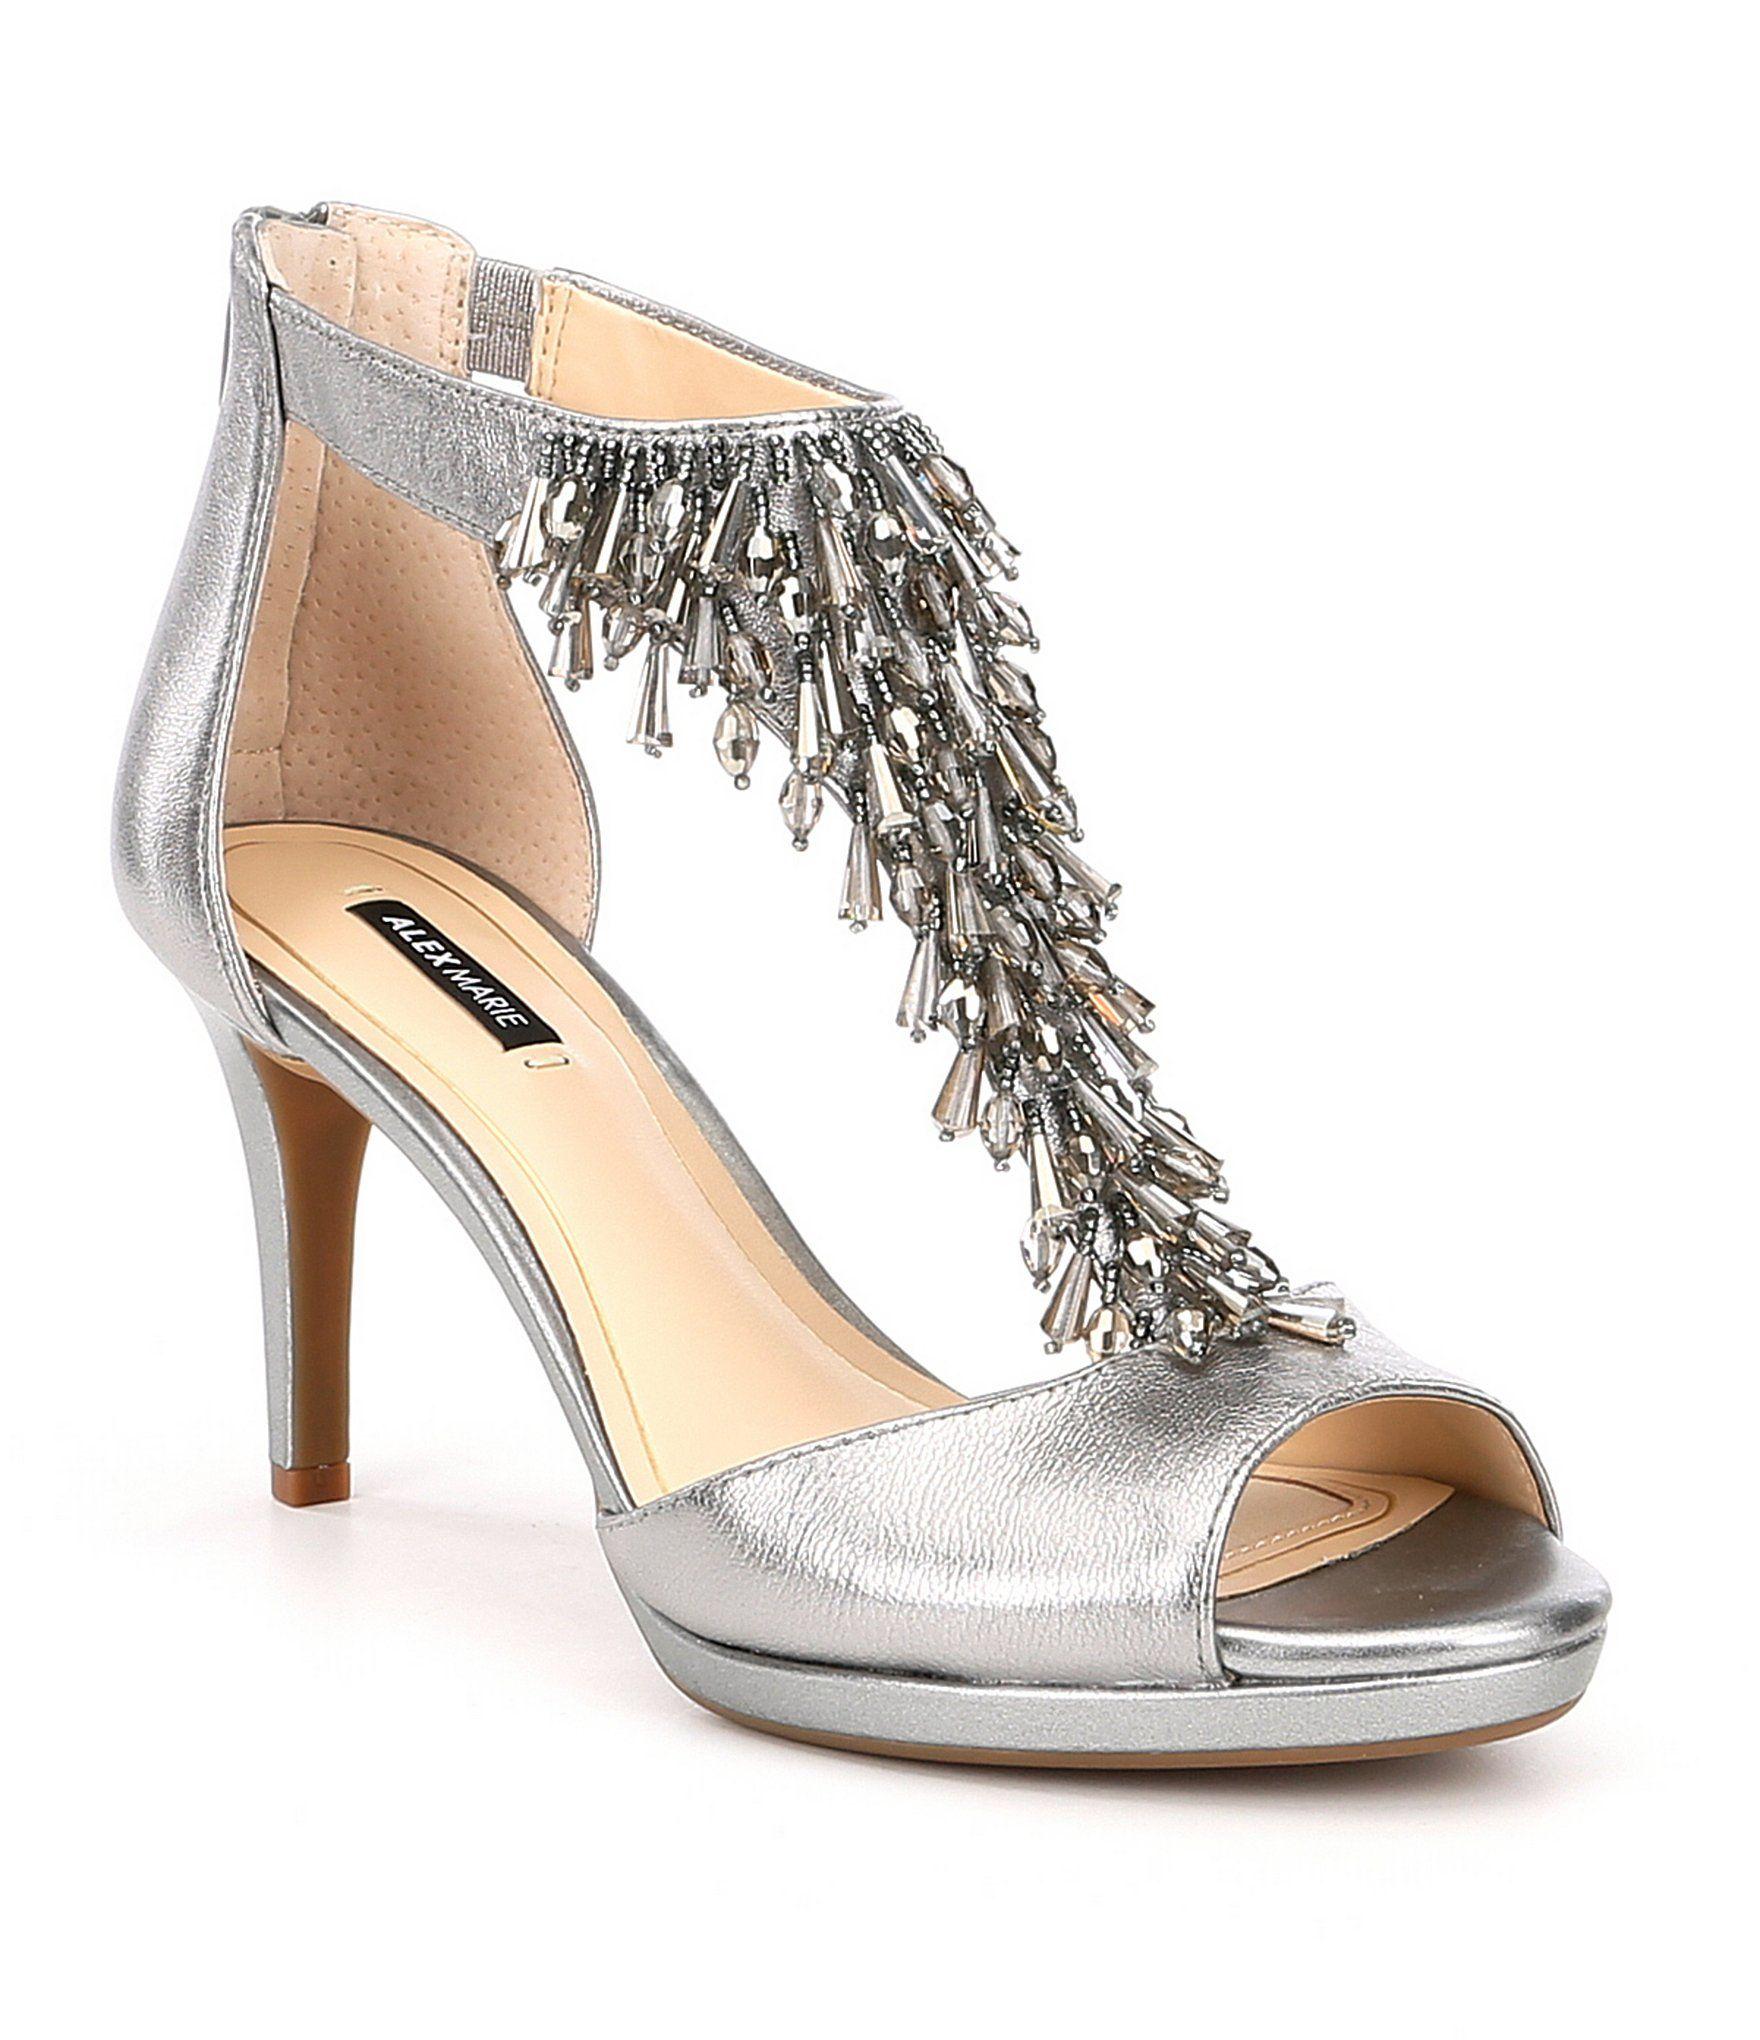 1cc5ecc42fb Alex Marie Dellah Beaded Metallic Leather Dress Sandals #Dillards ...